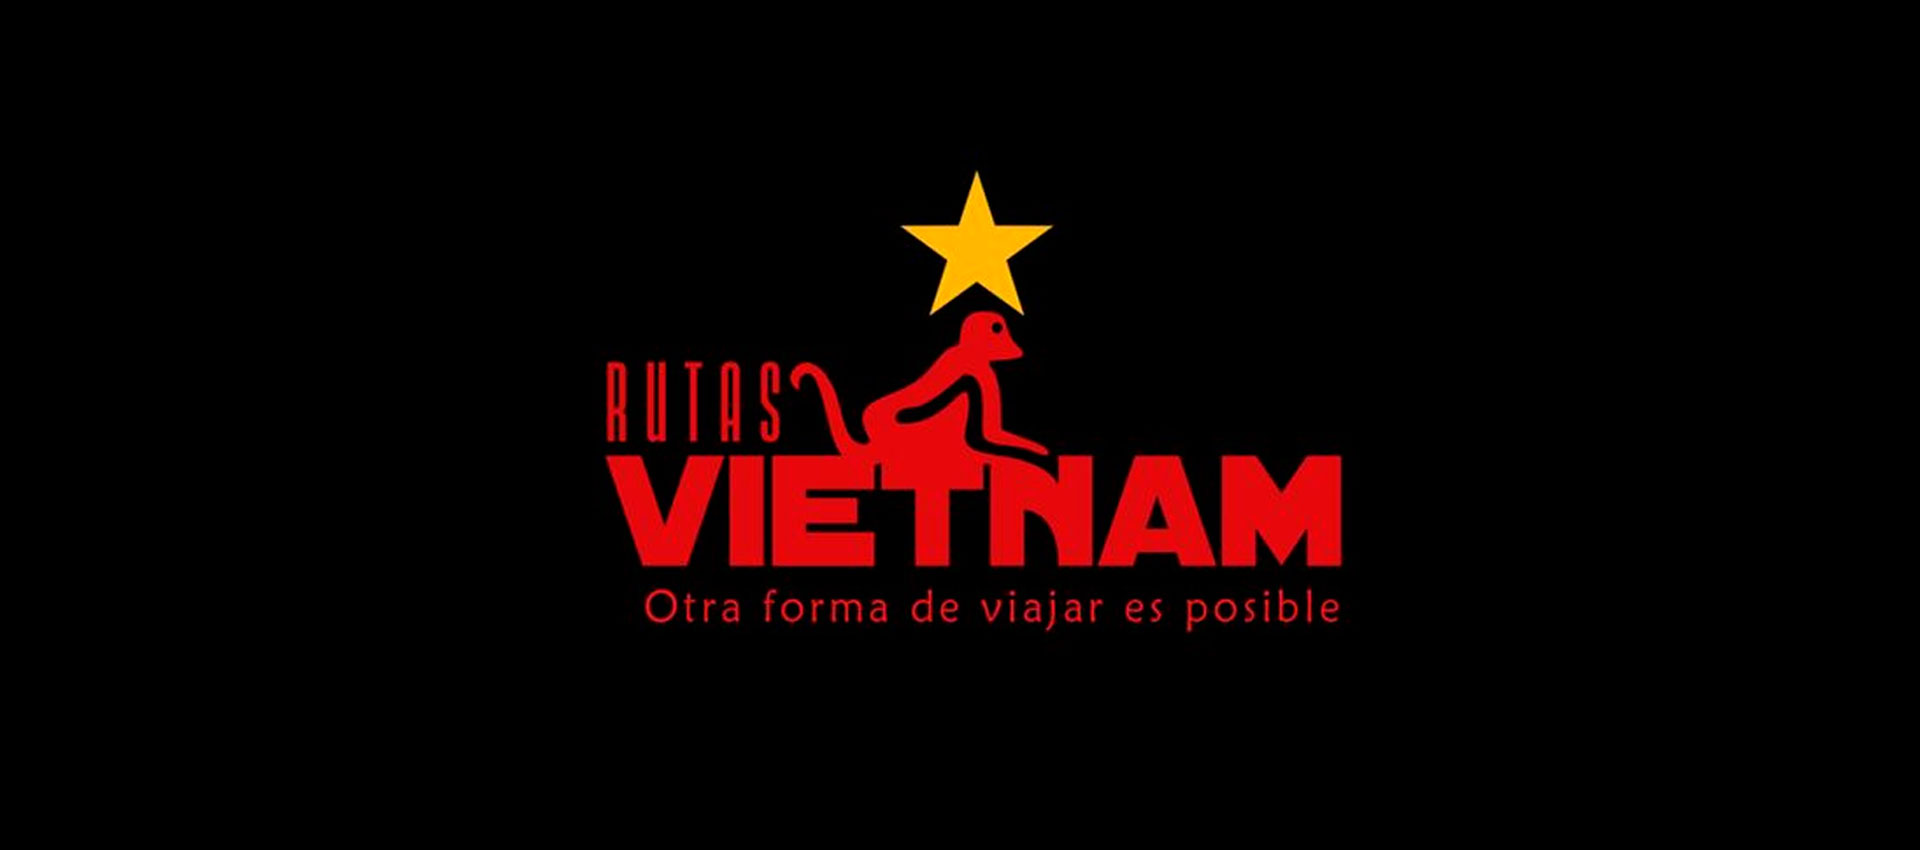 Rutas-Vietnam Spots & Eventos Corporativos - video boda cadiz